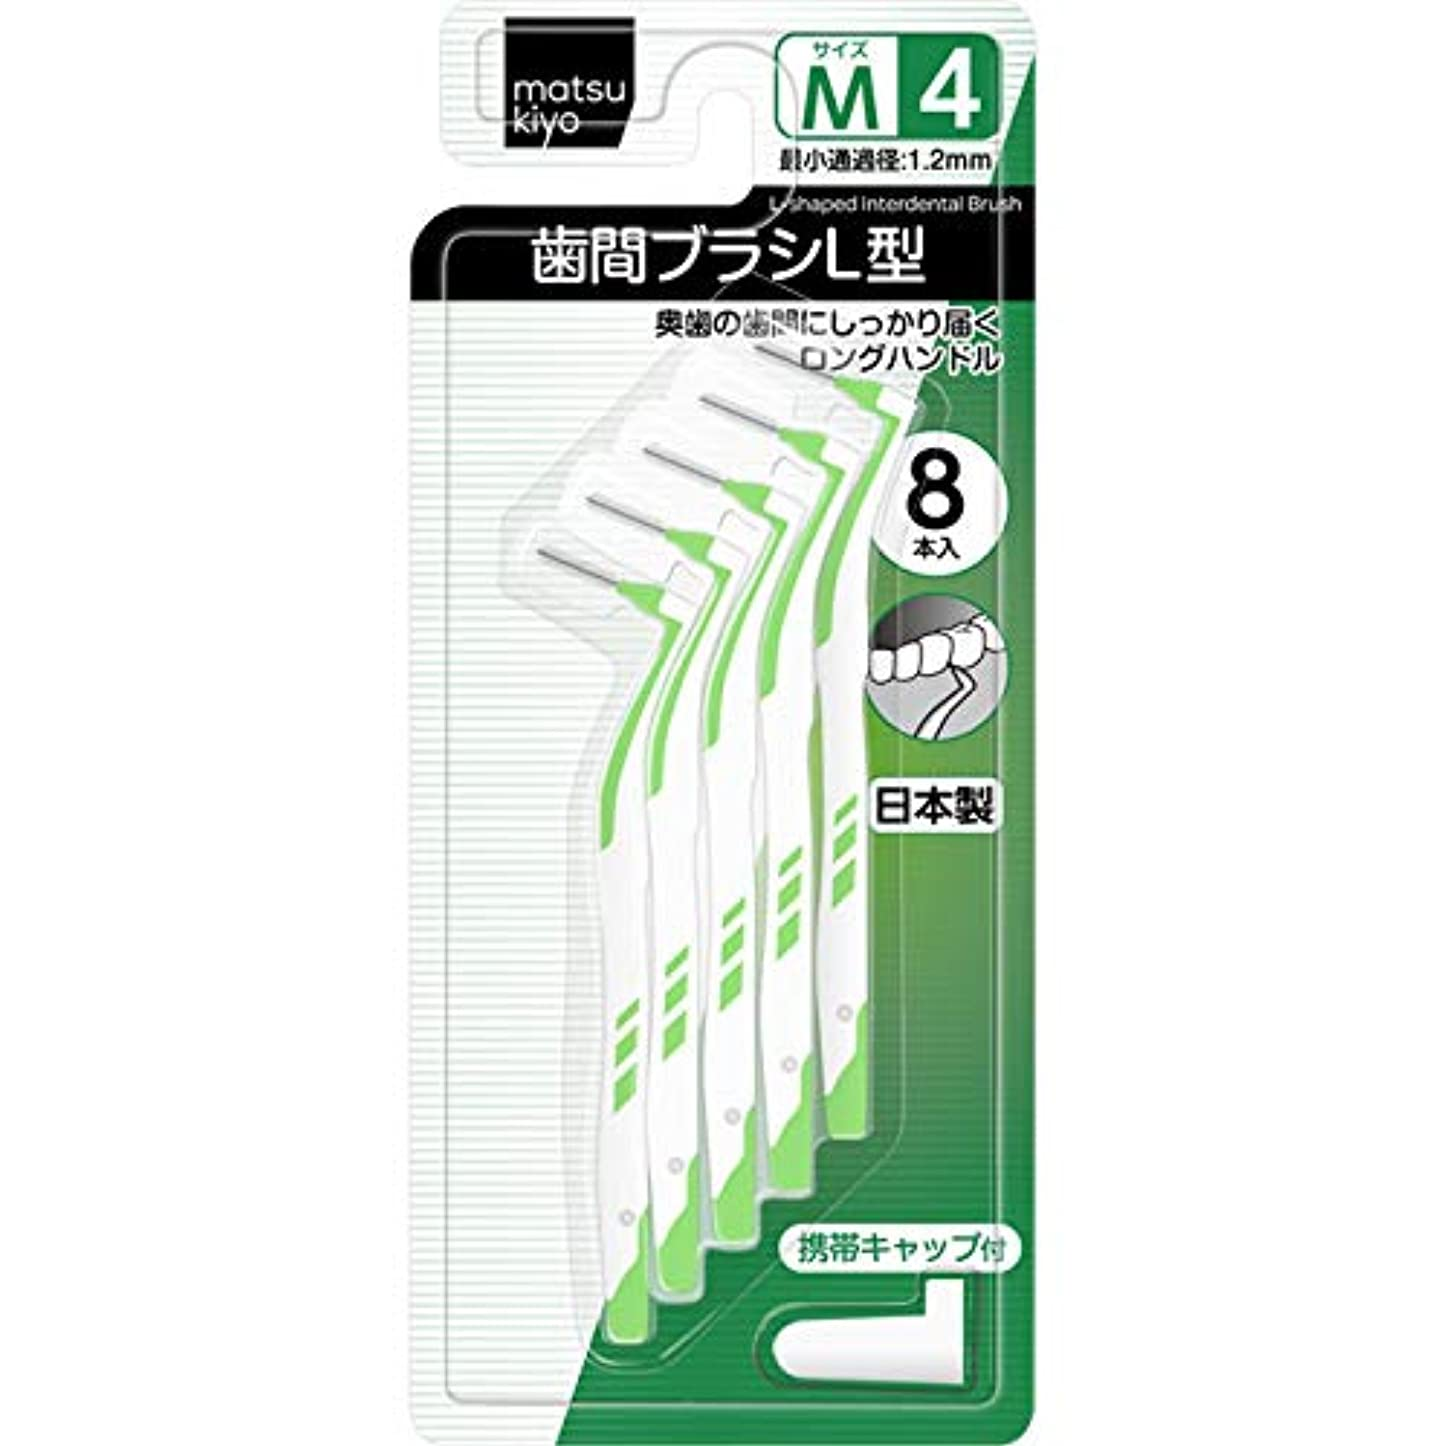 matsukiyo 歯間ブラシL型 サイズ4(M) 8本